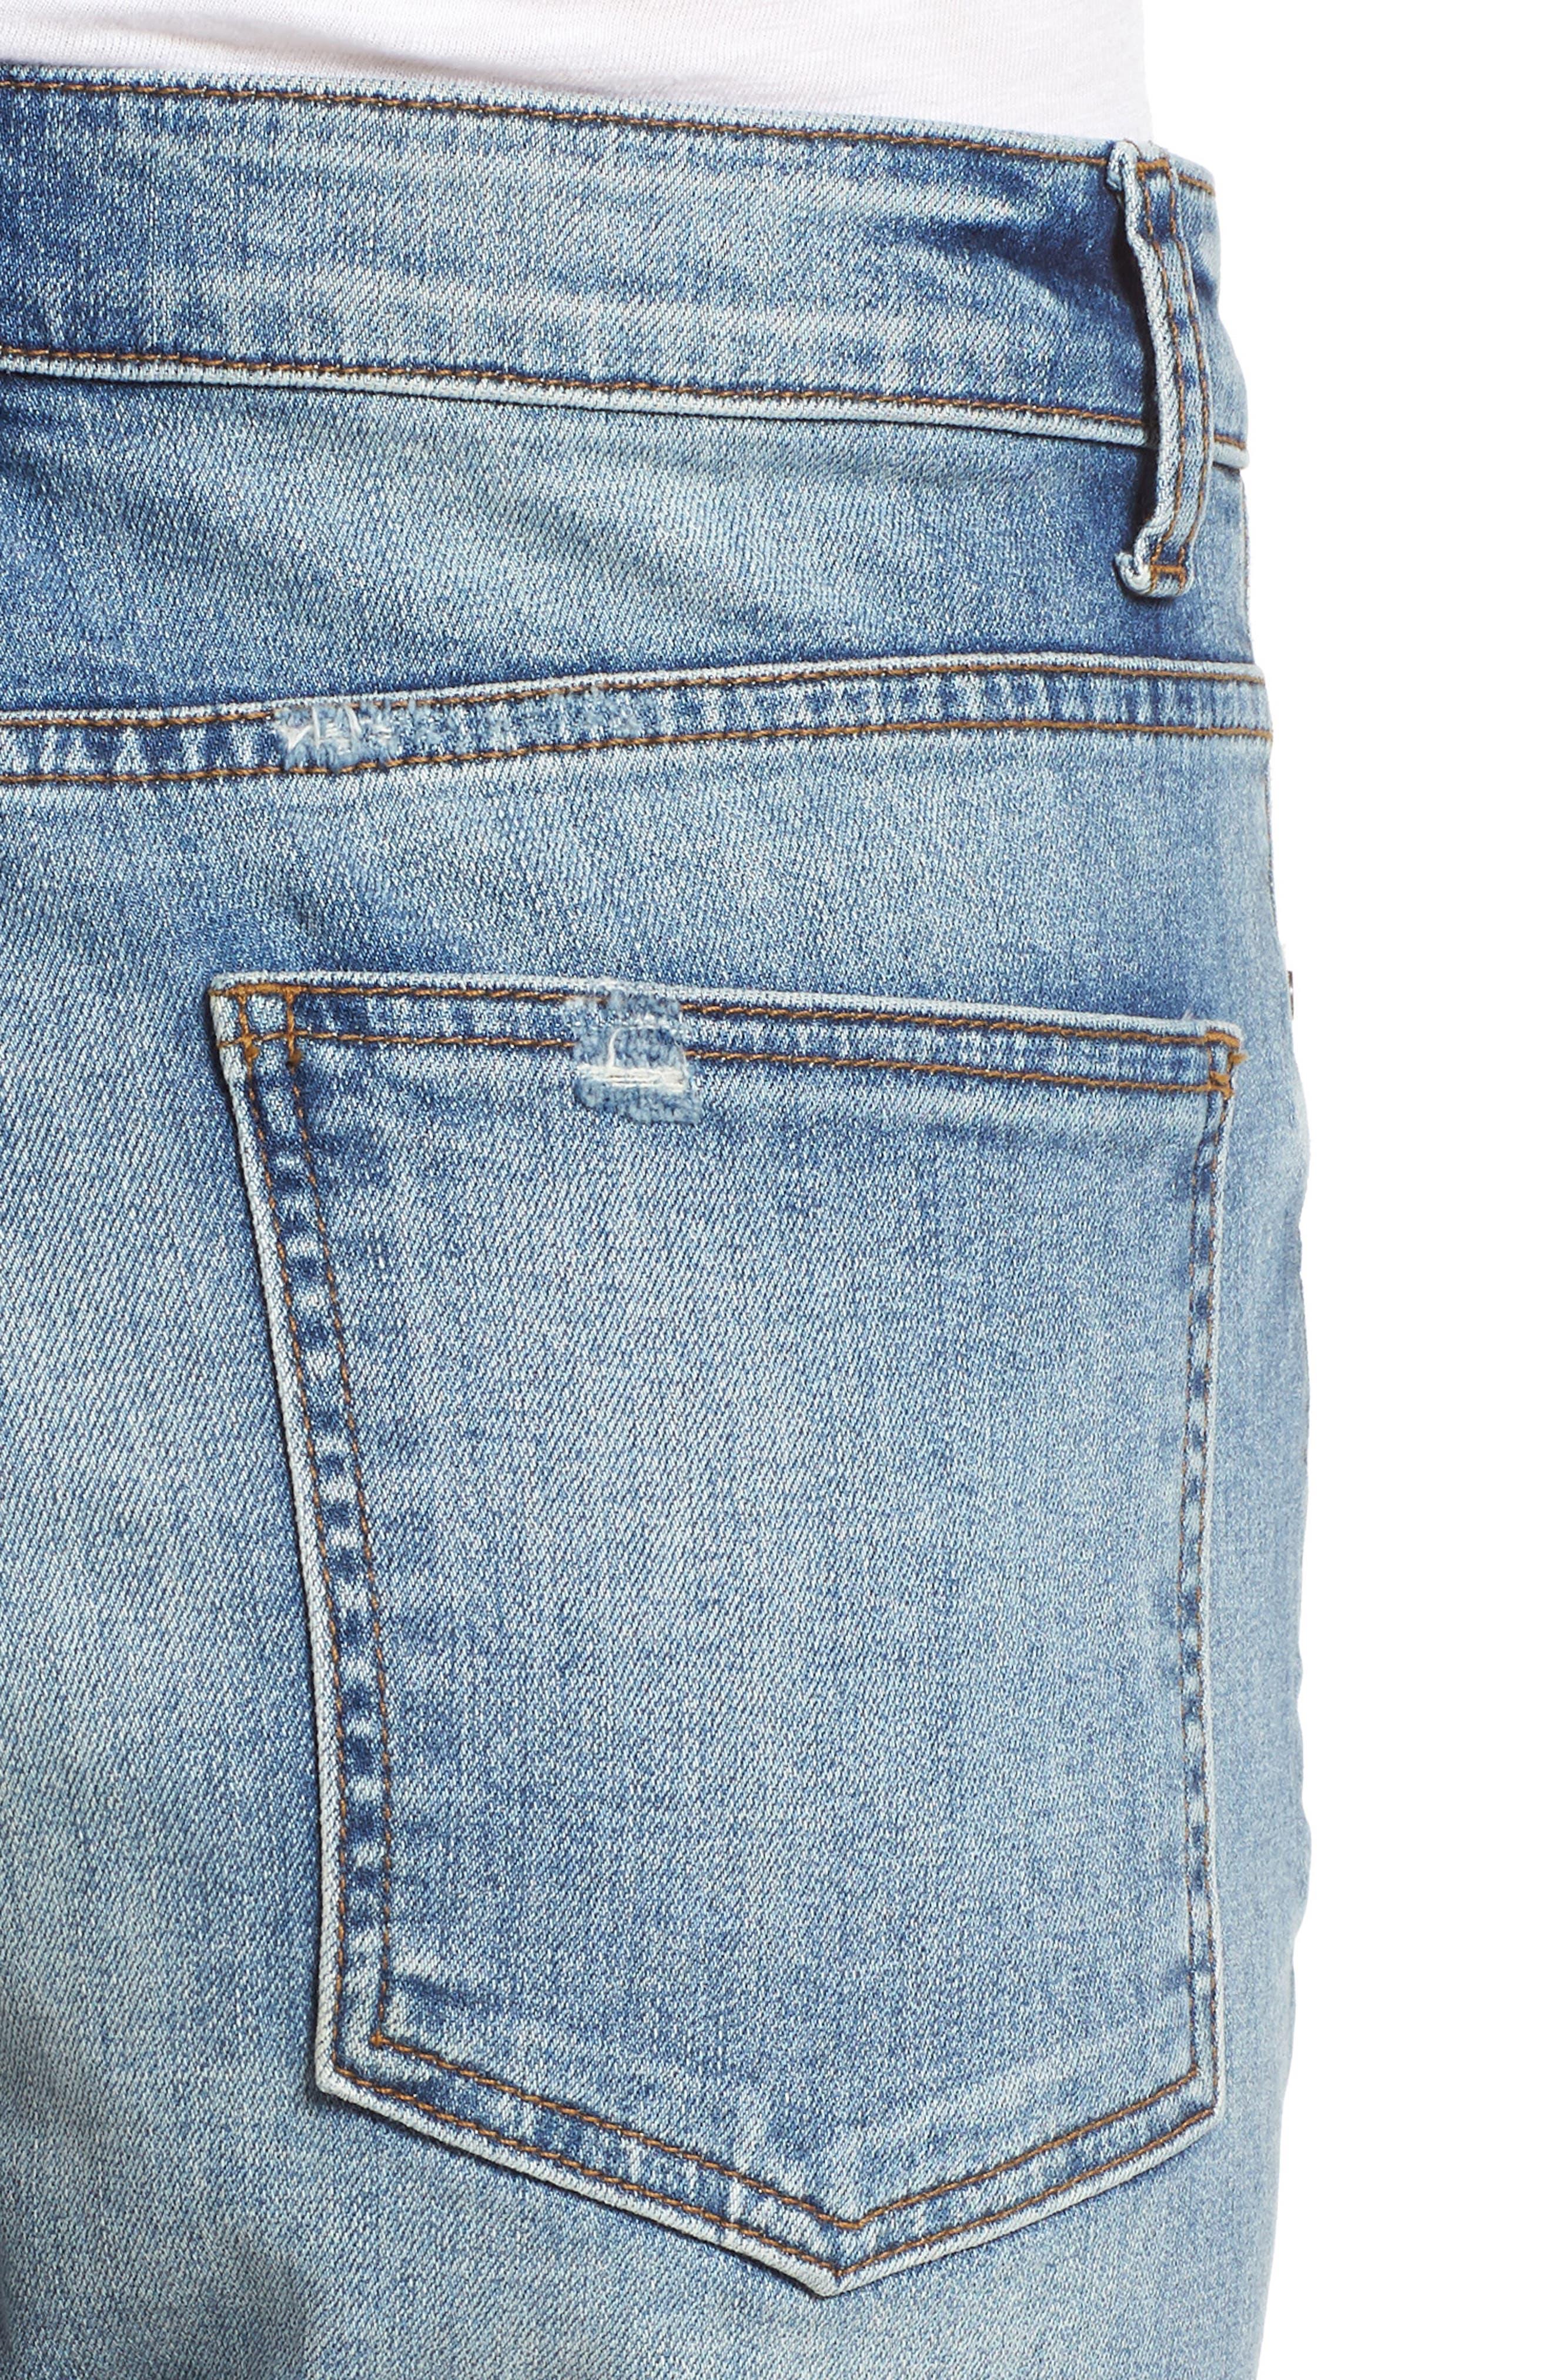 High Waist Crop Jeans,                             Alternate thumbnail 4, color,                             400